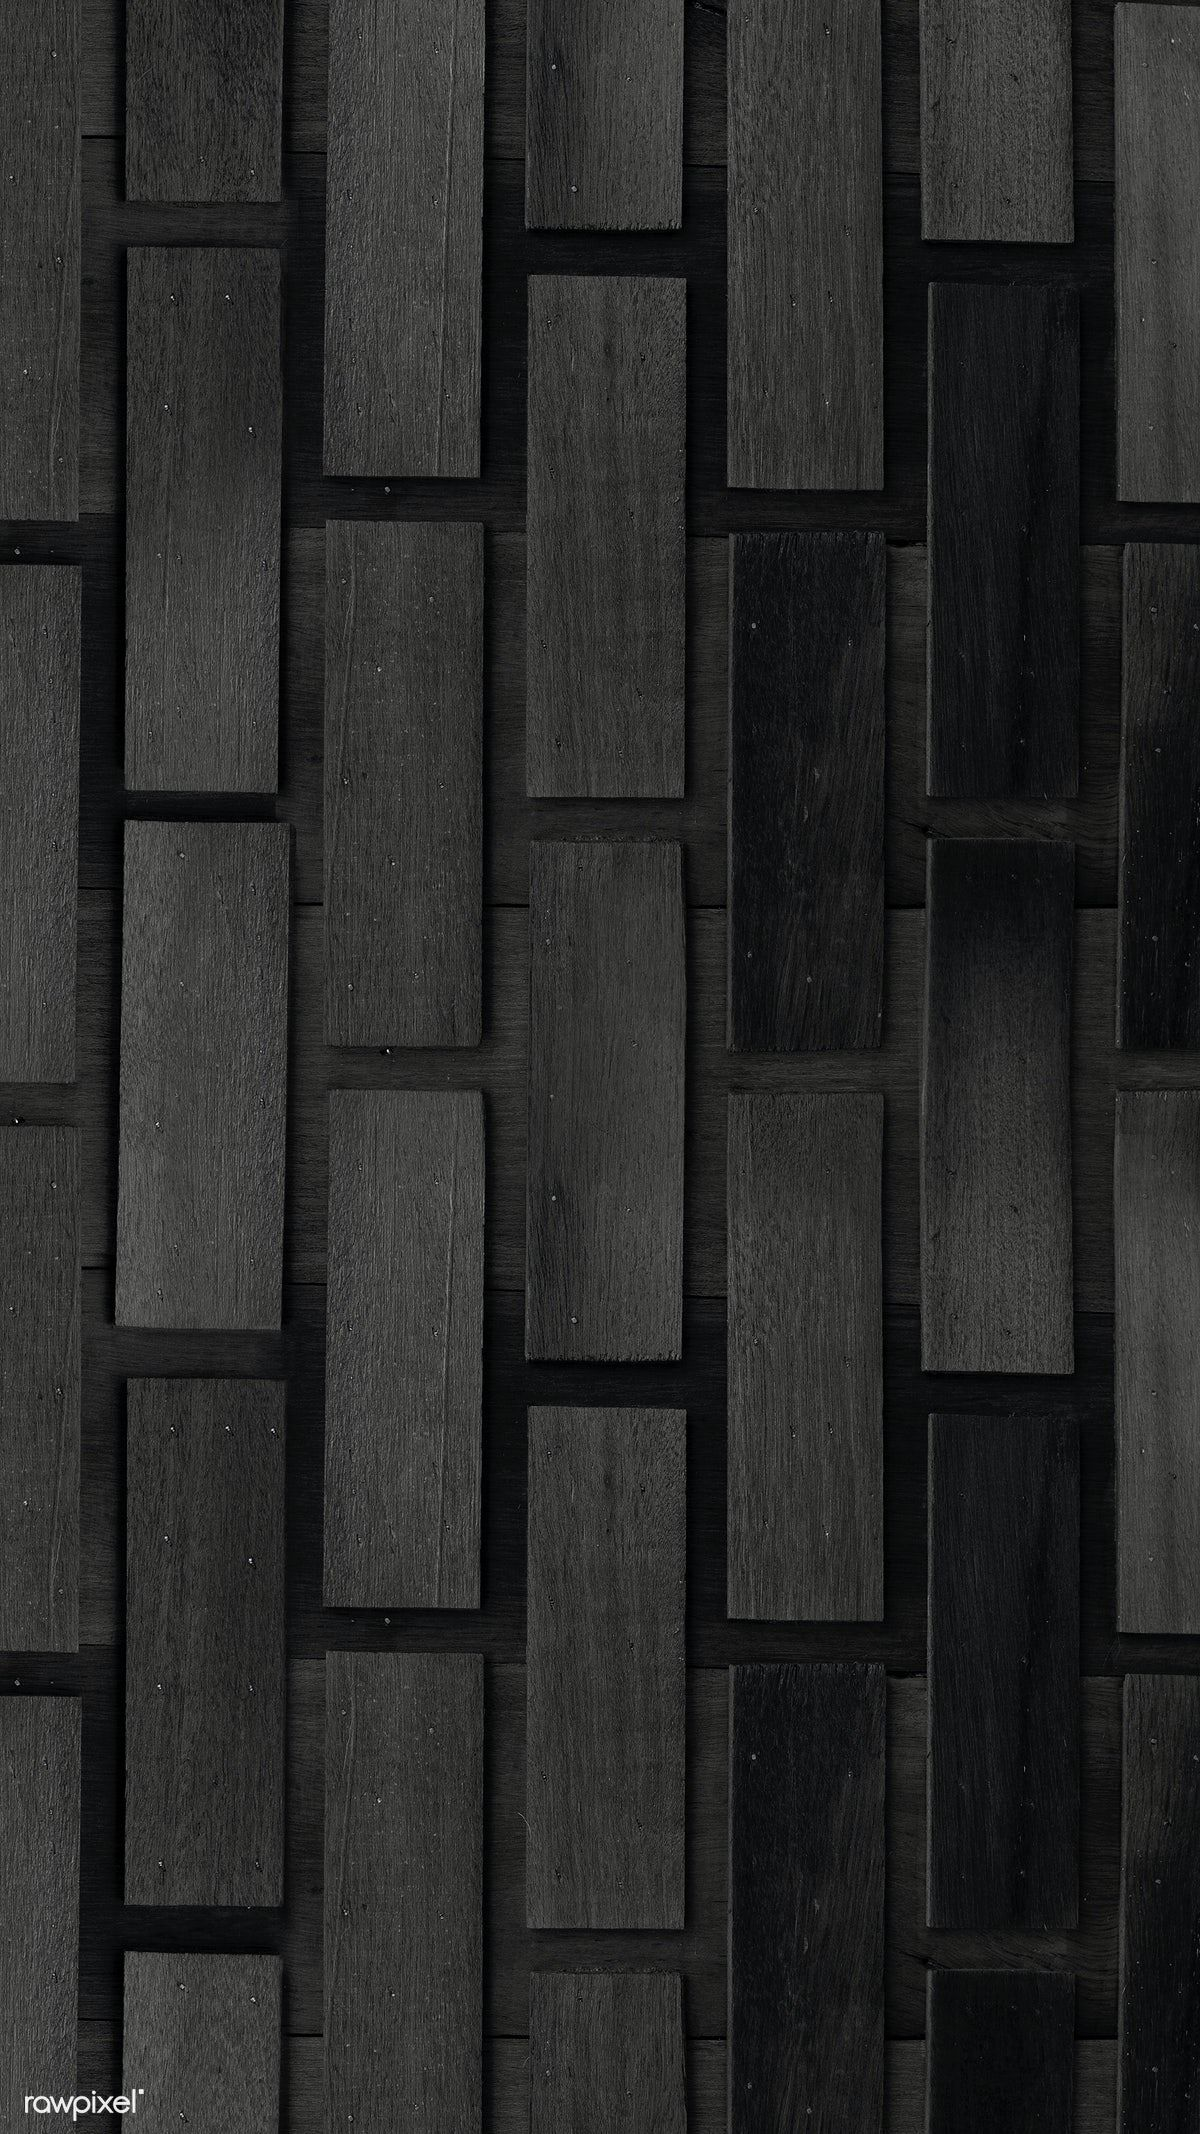 Download Premium Illustration Of Gray Concrete Brick Wall Pattern Mobile In 2020 Wall Patterns Concrete Bricks Brick Wallpaper Iphone